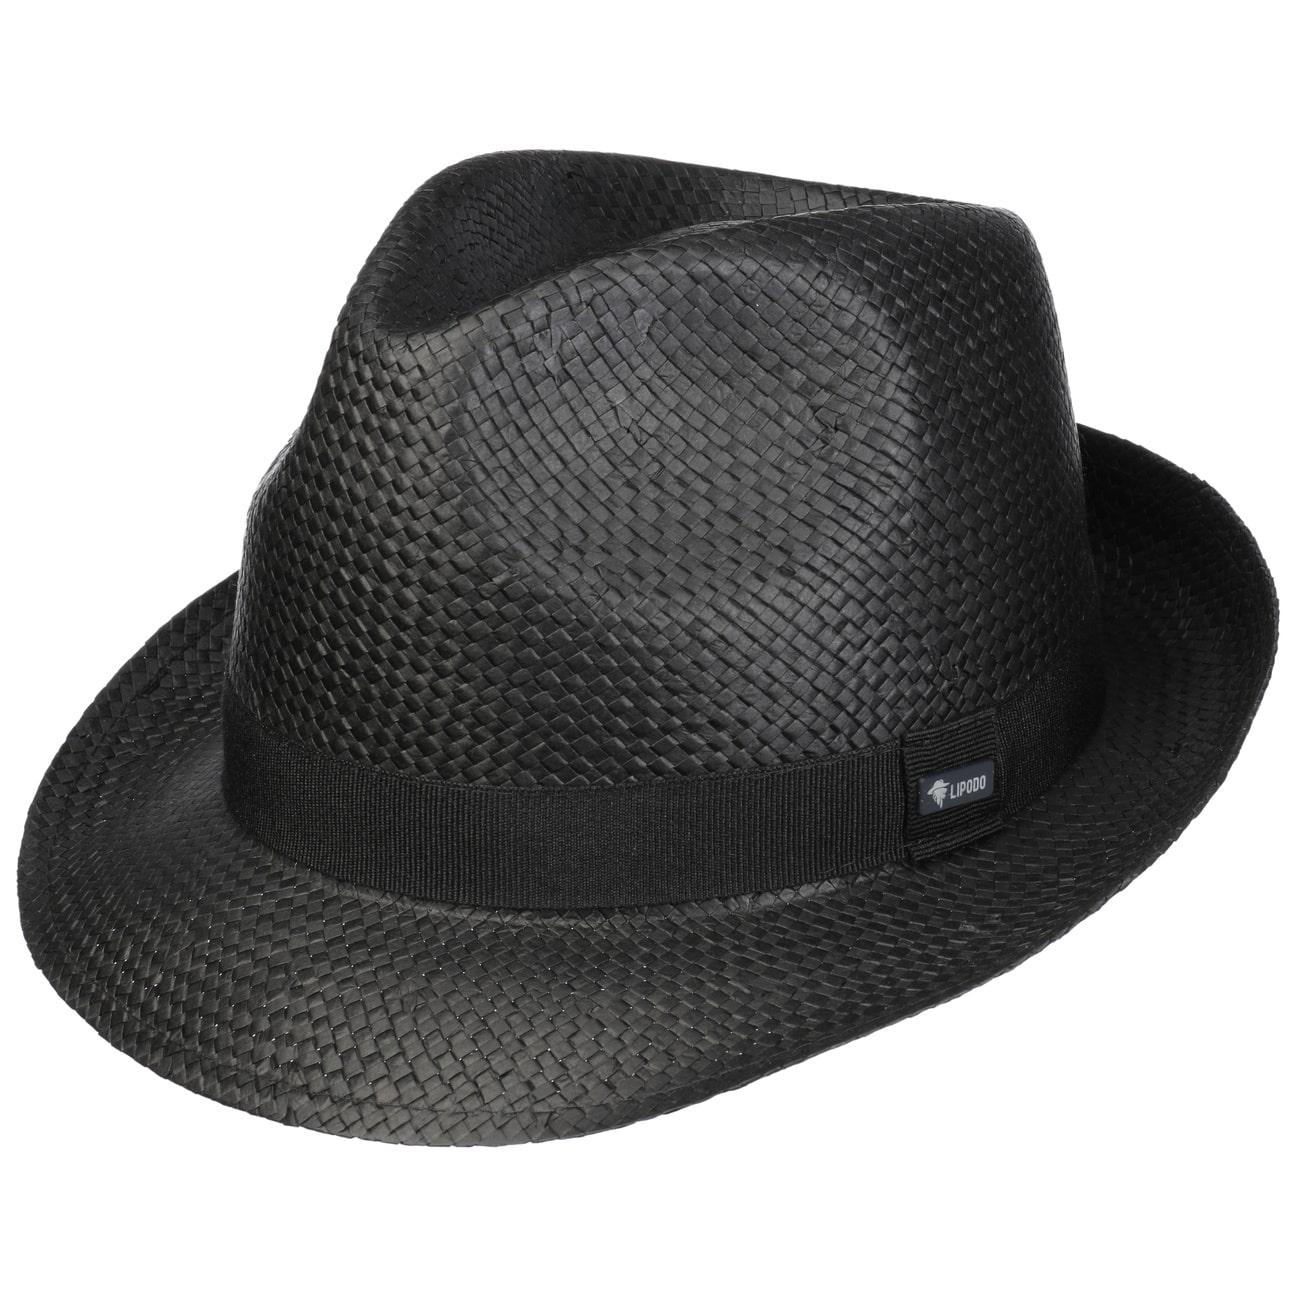 Sombrero Black City Trilby by Lipodo  sombrero de verano